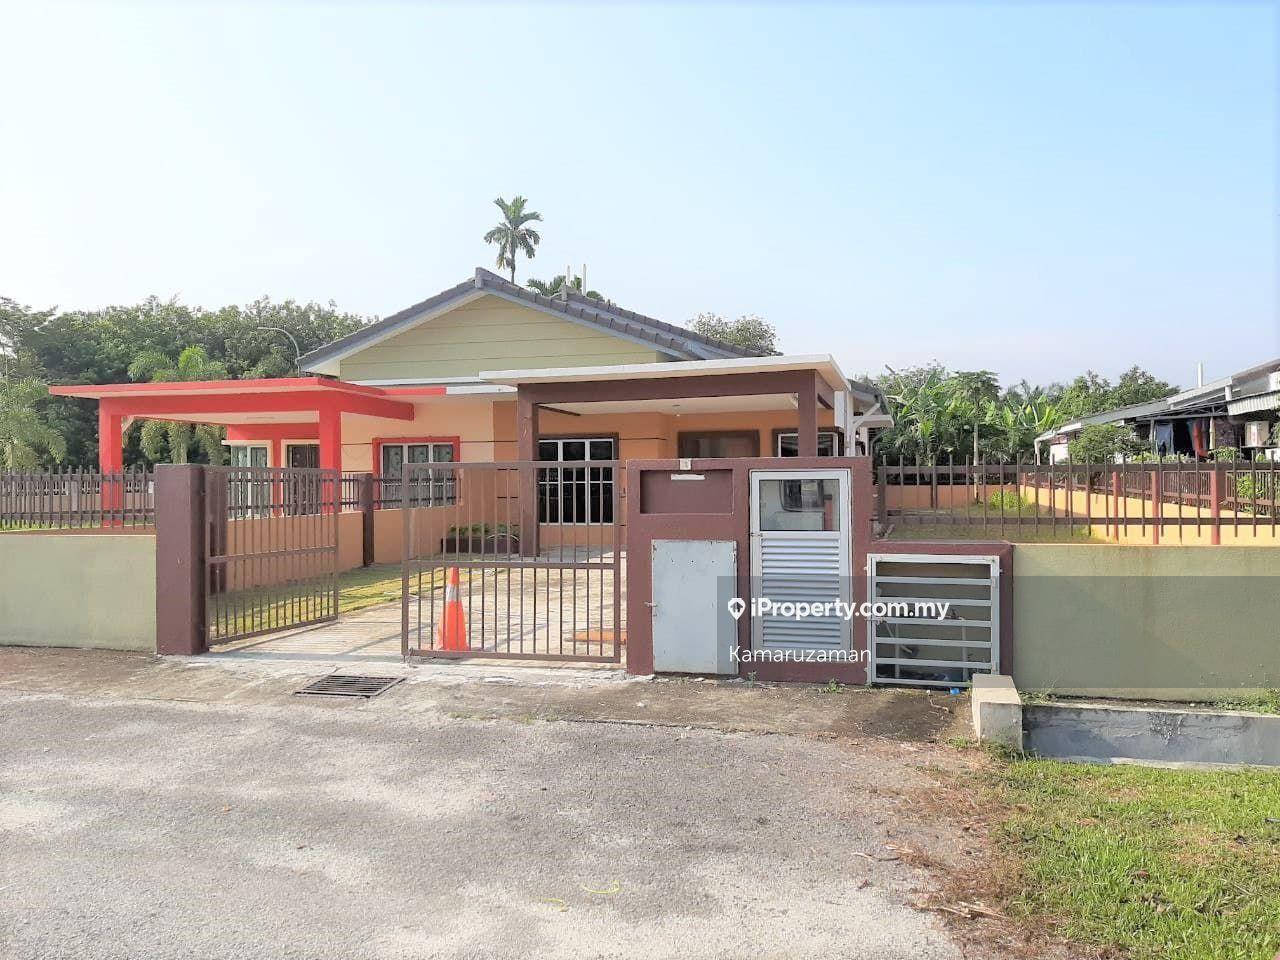 Jalan Merbuk, Jenjarom, Kuala Langat